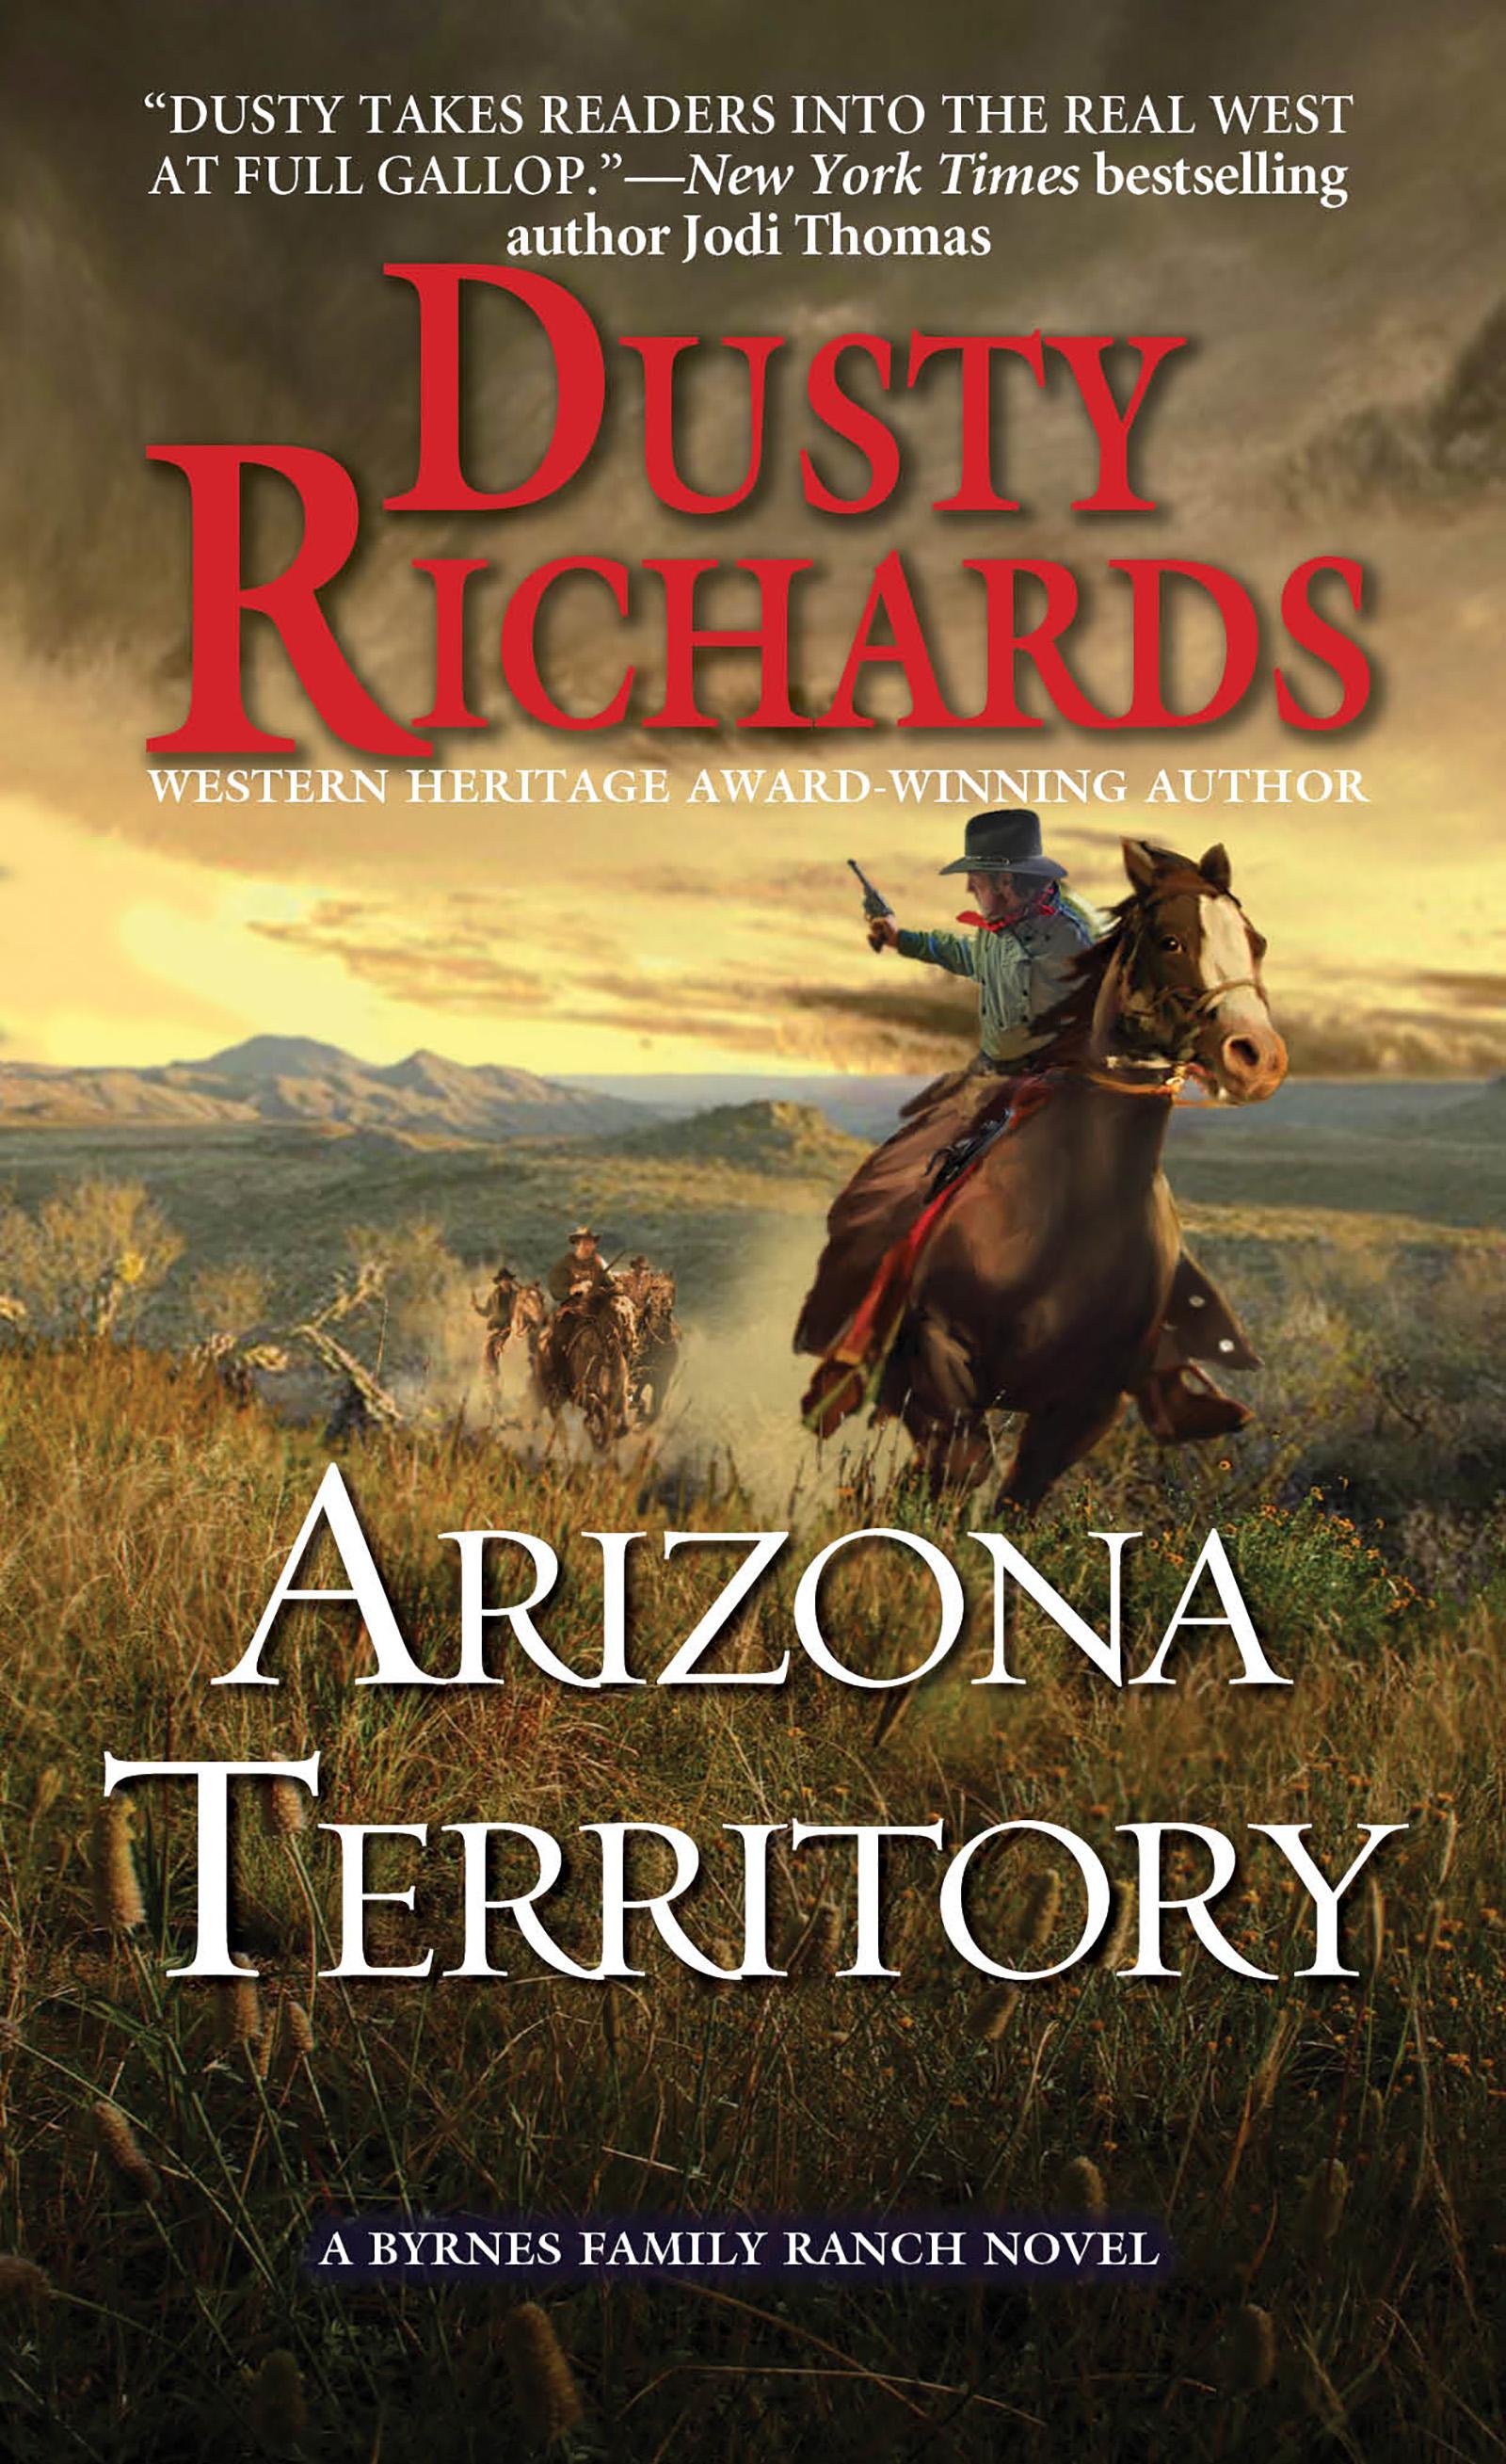 Arizona territory